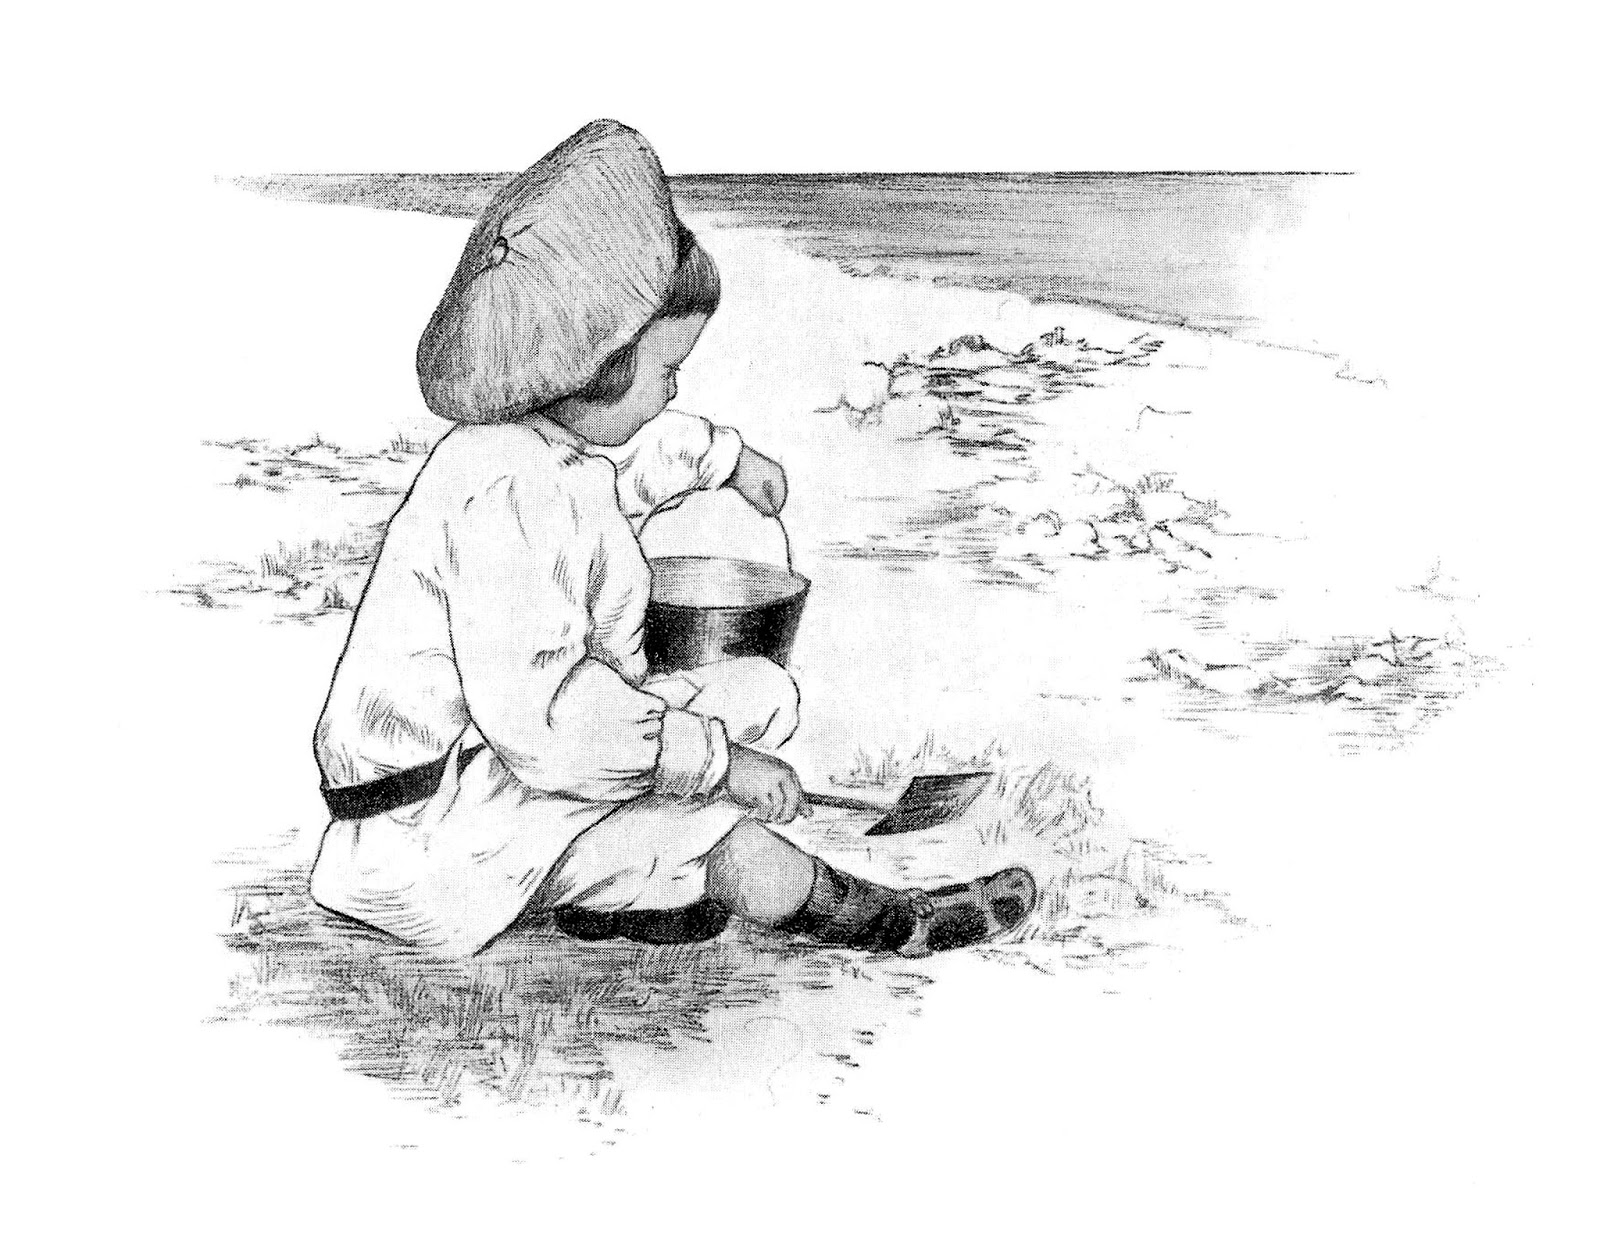 Child beach toy artwork drawing illustration digital download